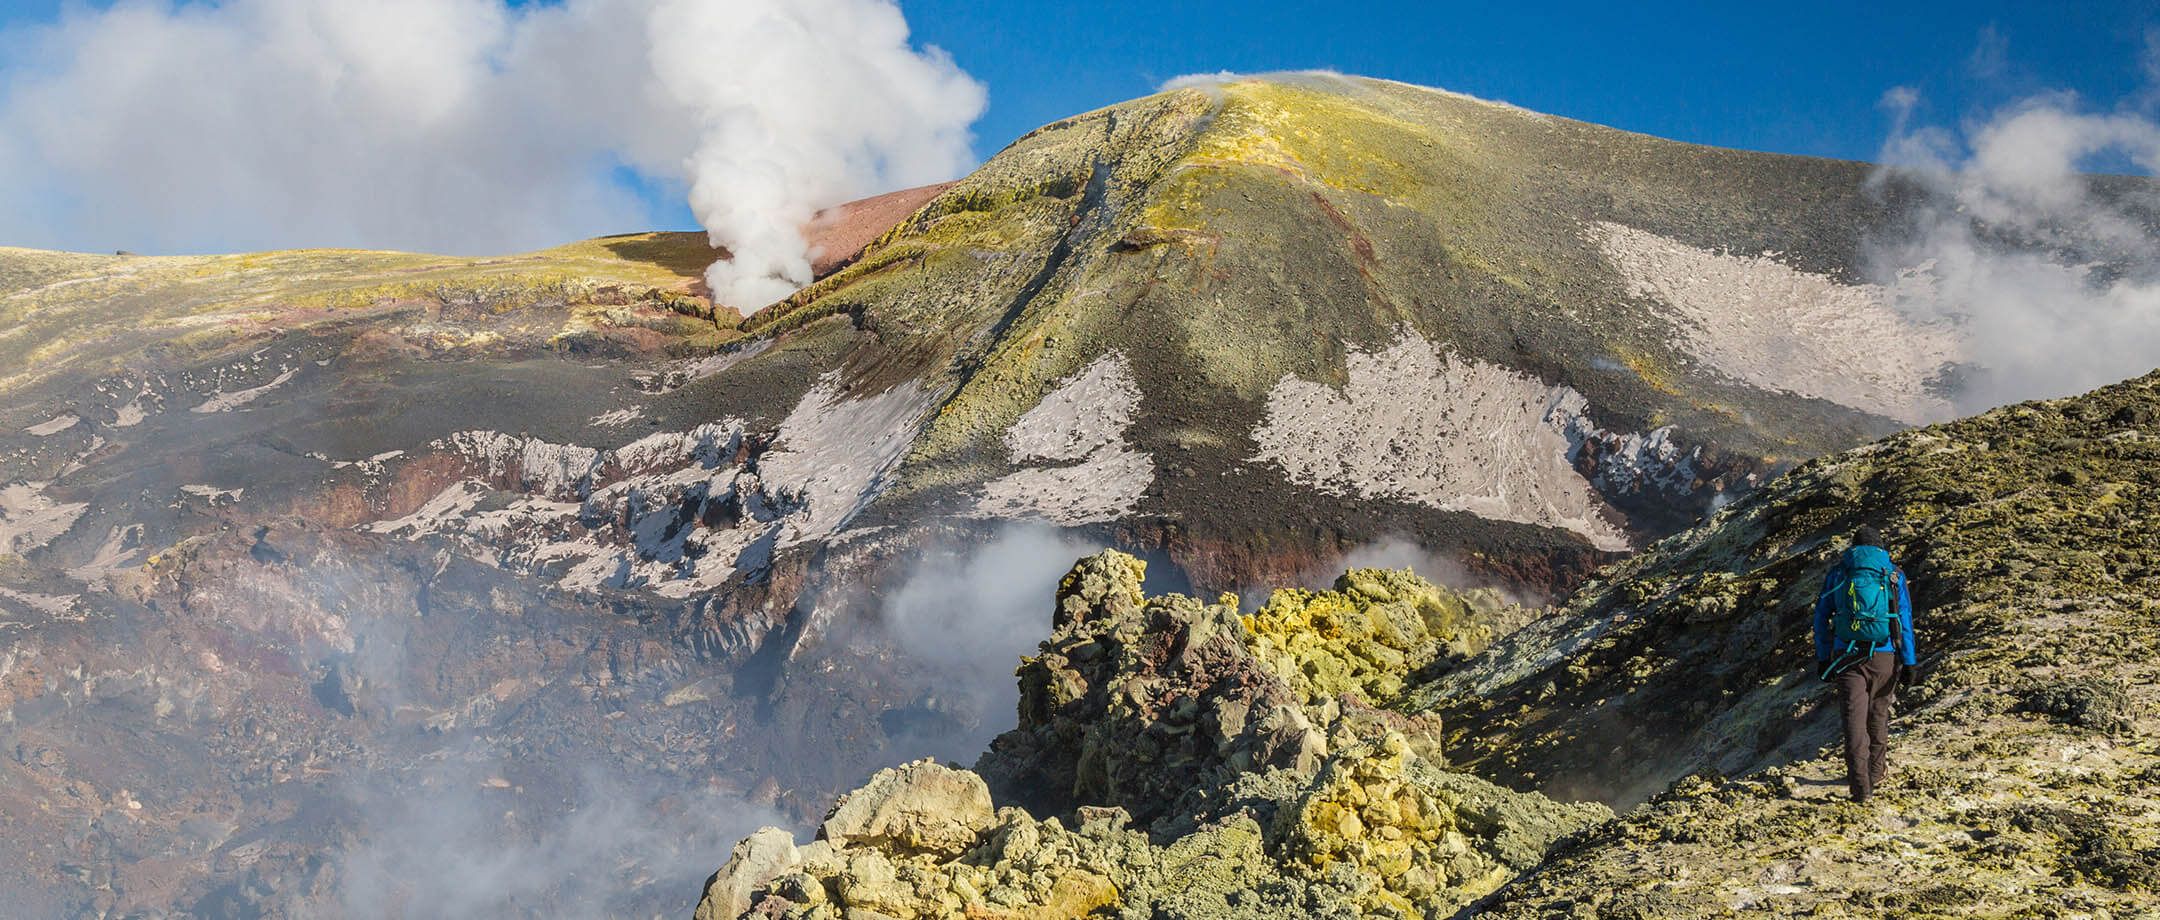 Mount Etna Summit Trekking 3350m